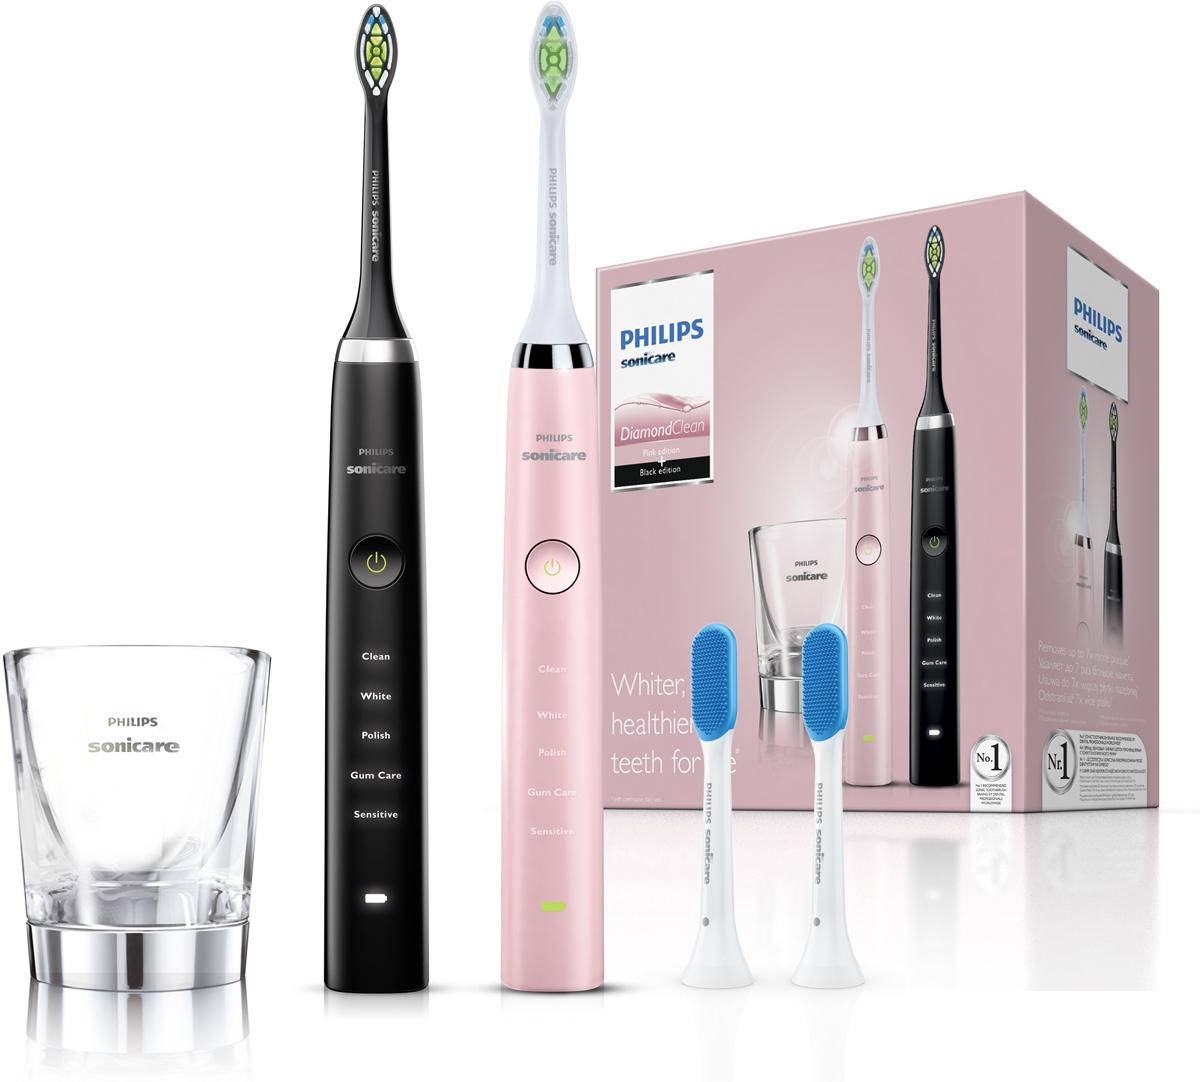 Philips HX9368/35, Black Pink набор электрических зубных щеток, 2 шт набор фильтров philips fc8066 01